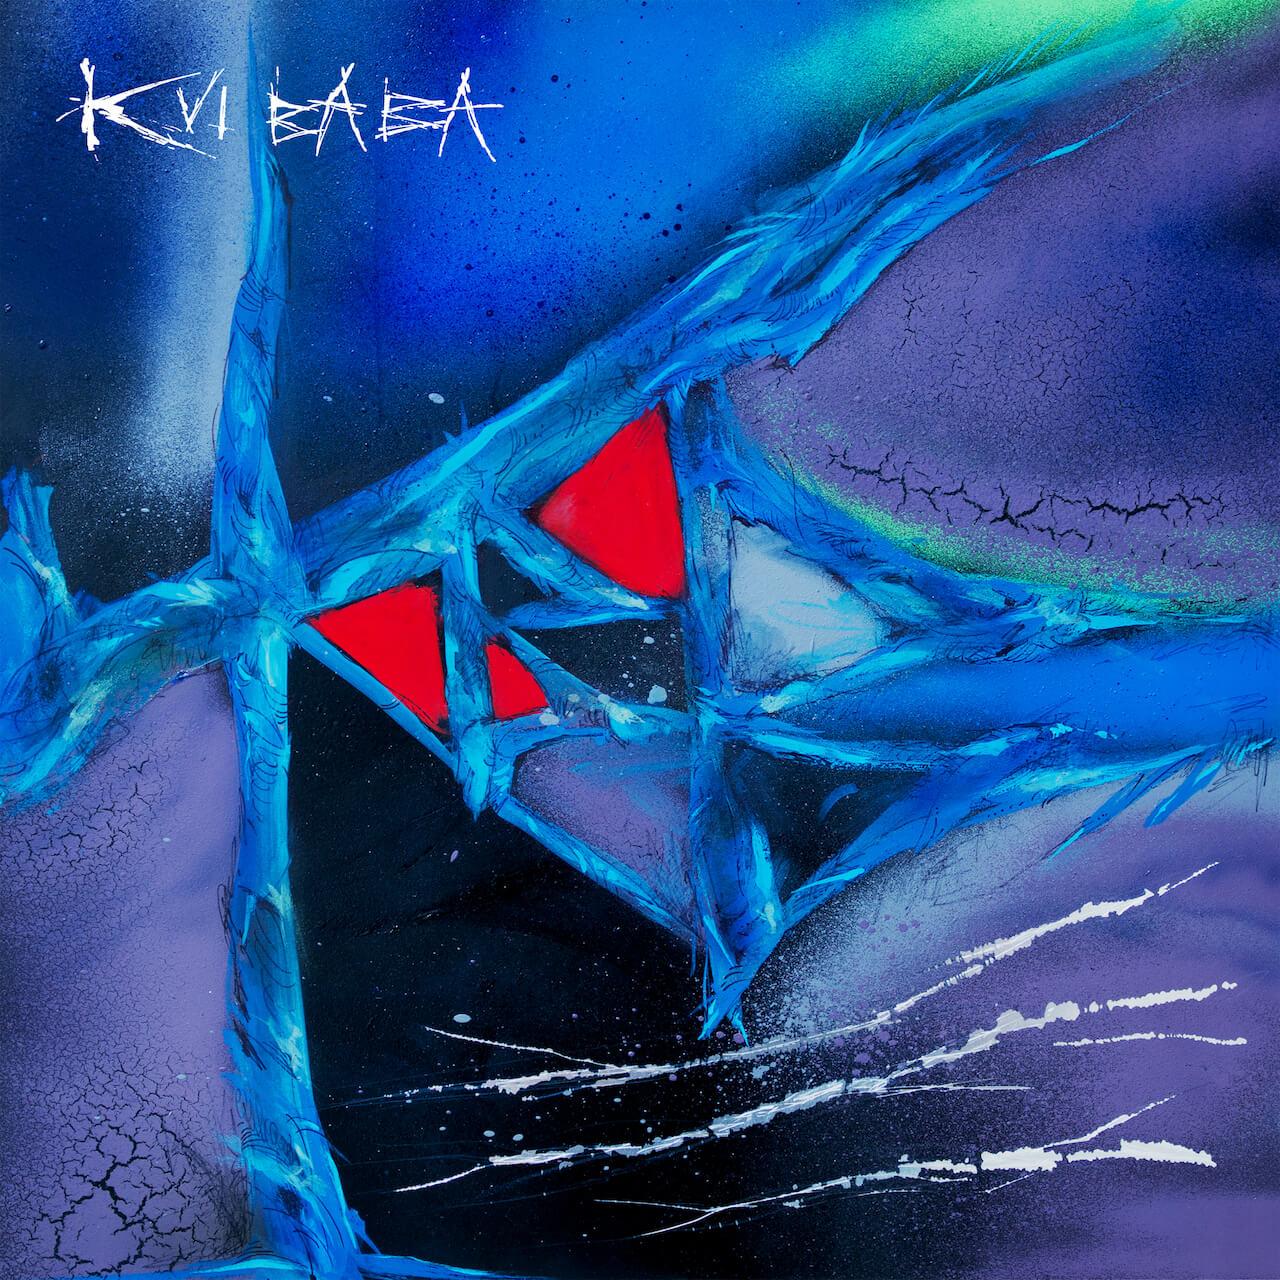 Kvi Baba、9月25日発売の1stアルバムより全編モノトーンで表現した序章的先行曲「Crystal Cry」のMVを公開 music190807-kvibaba-1